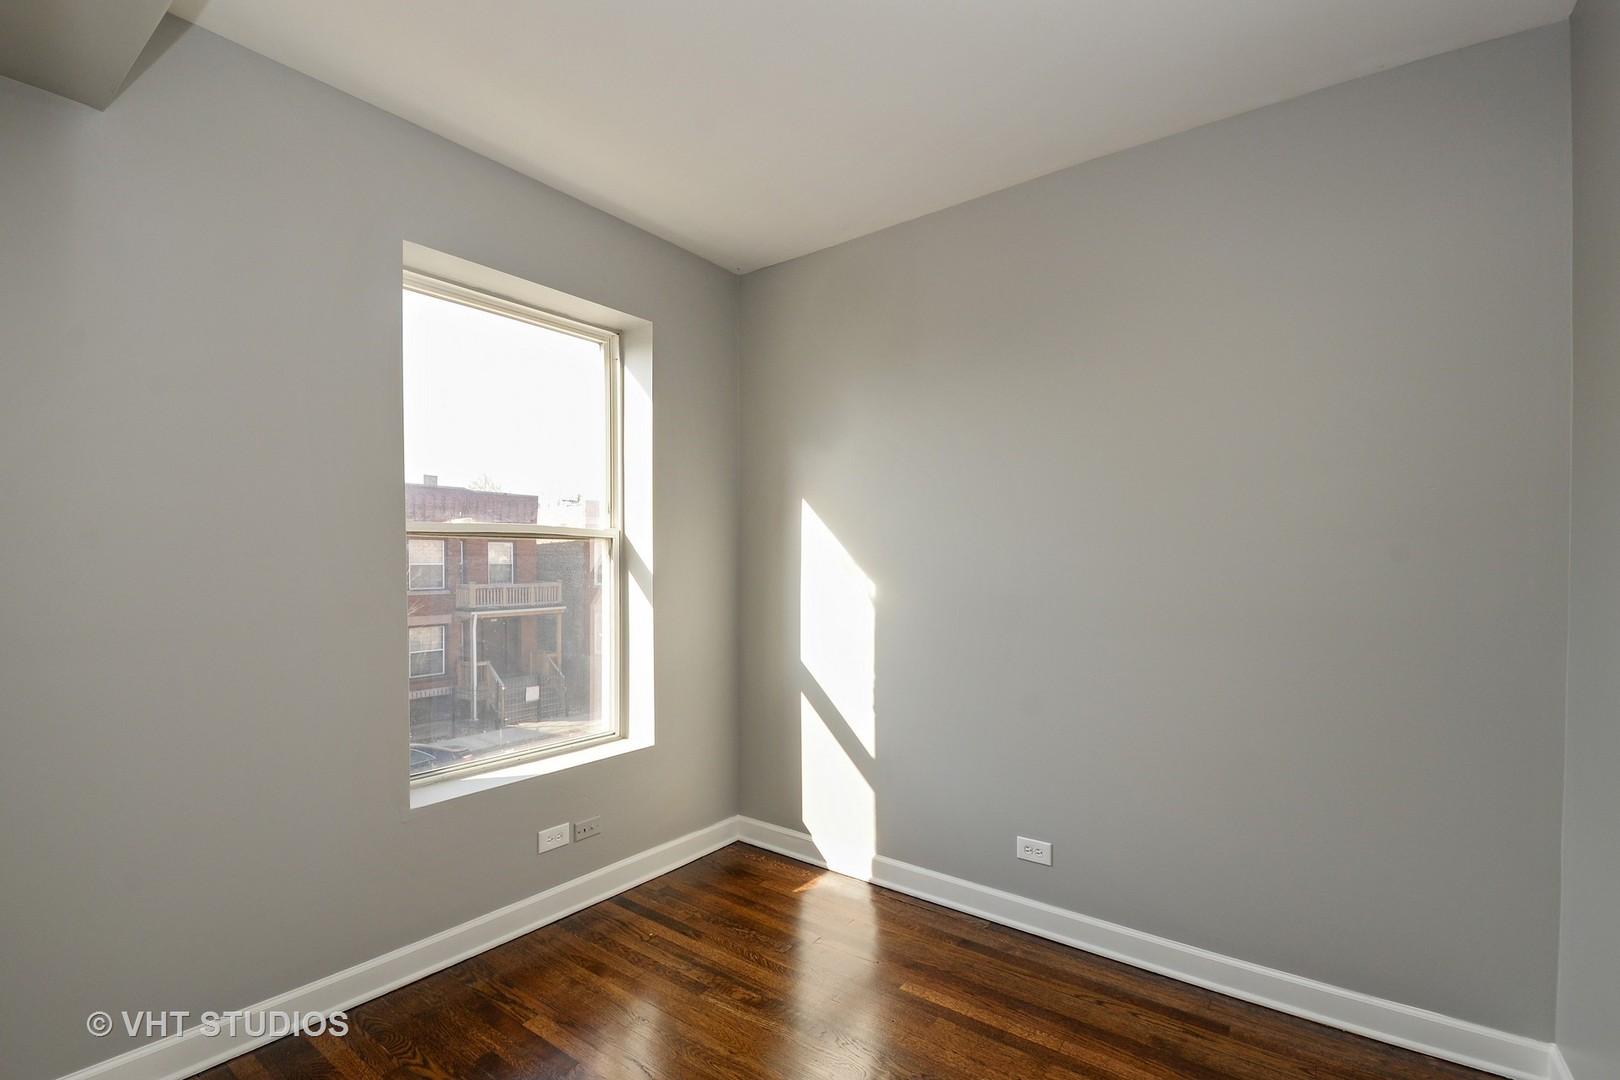 3410 Walnut ,Chicago, Illinois 60624